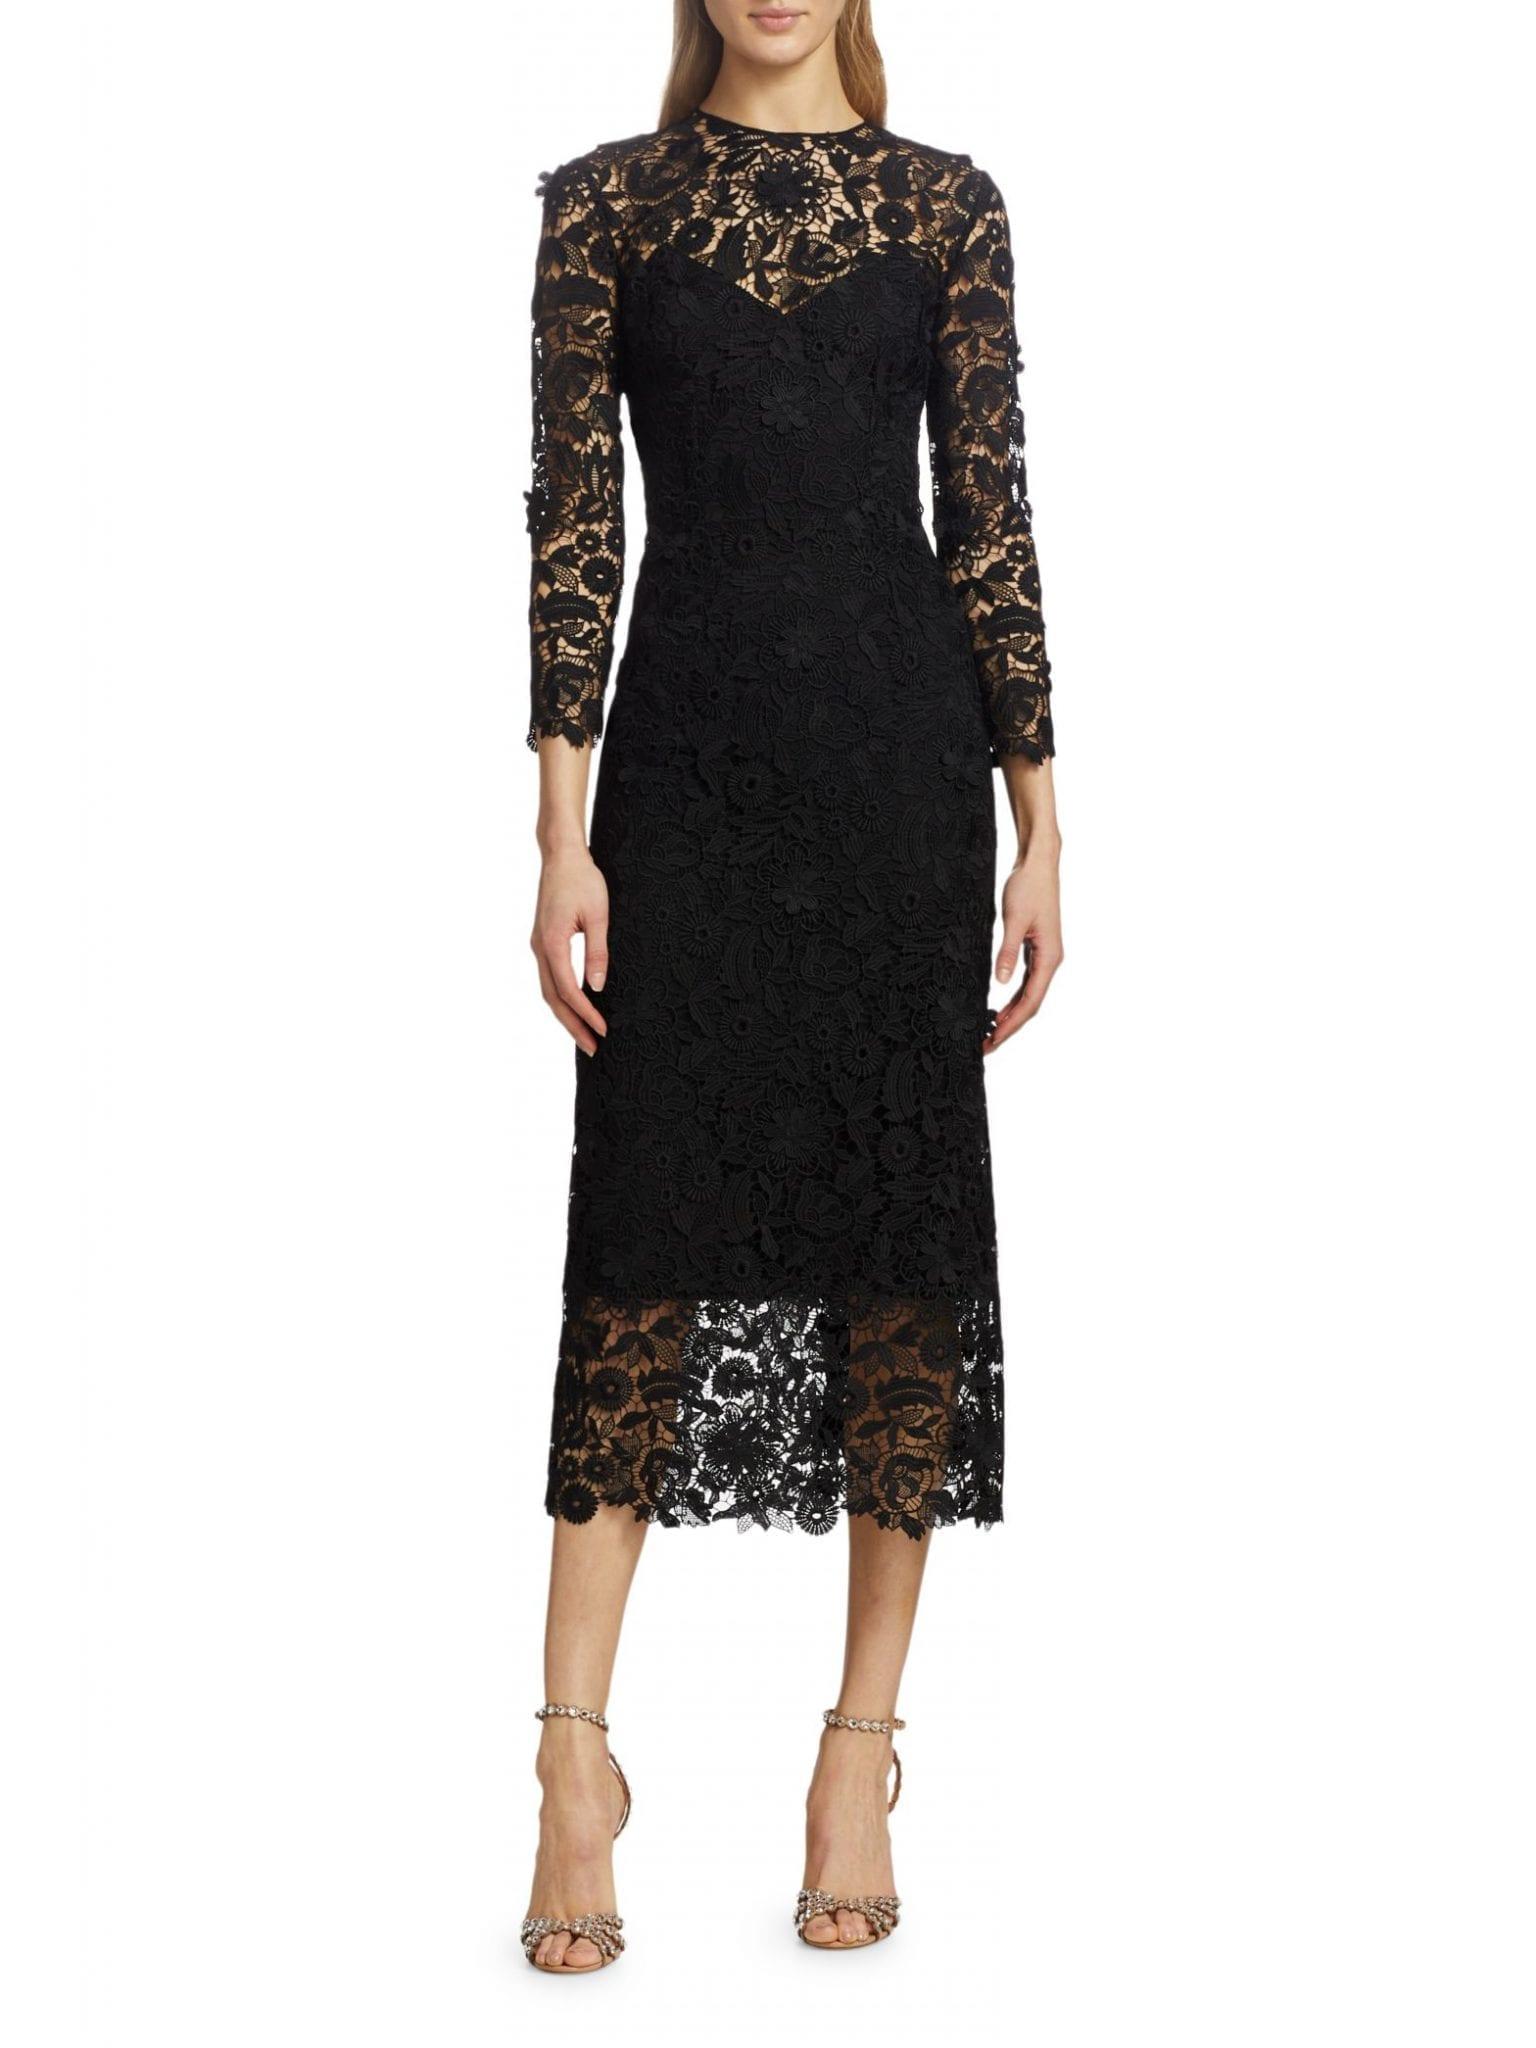 CAROLINA HERRERA Floral Lace Sheath Dress